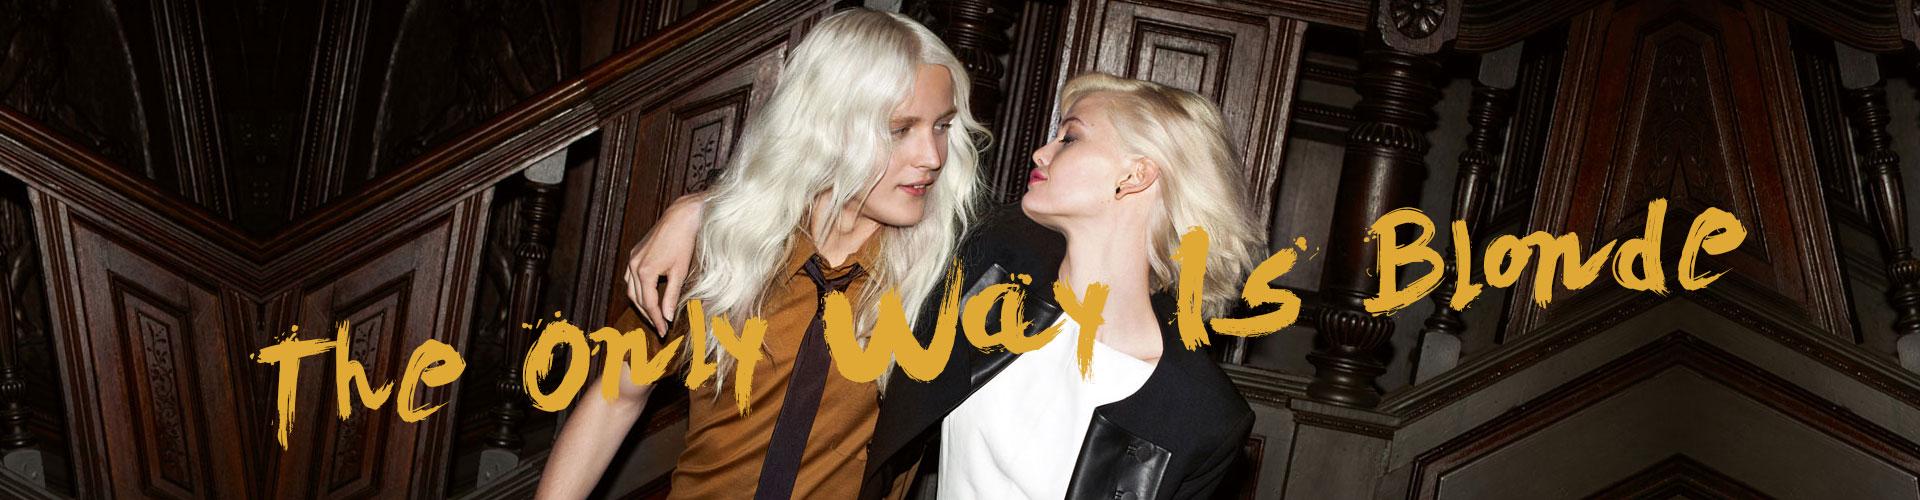 blonde army, blonde envy hair salons, going blonde, milton keynes, towcester